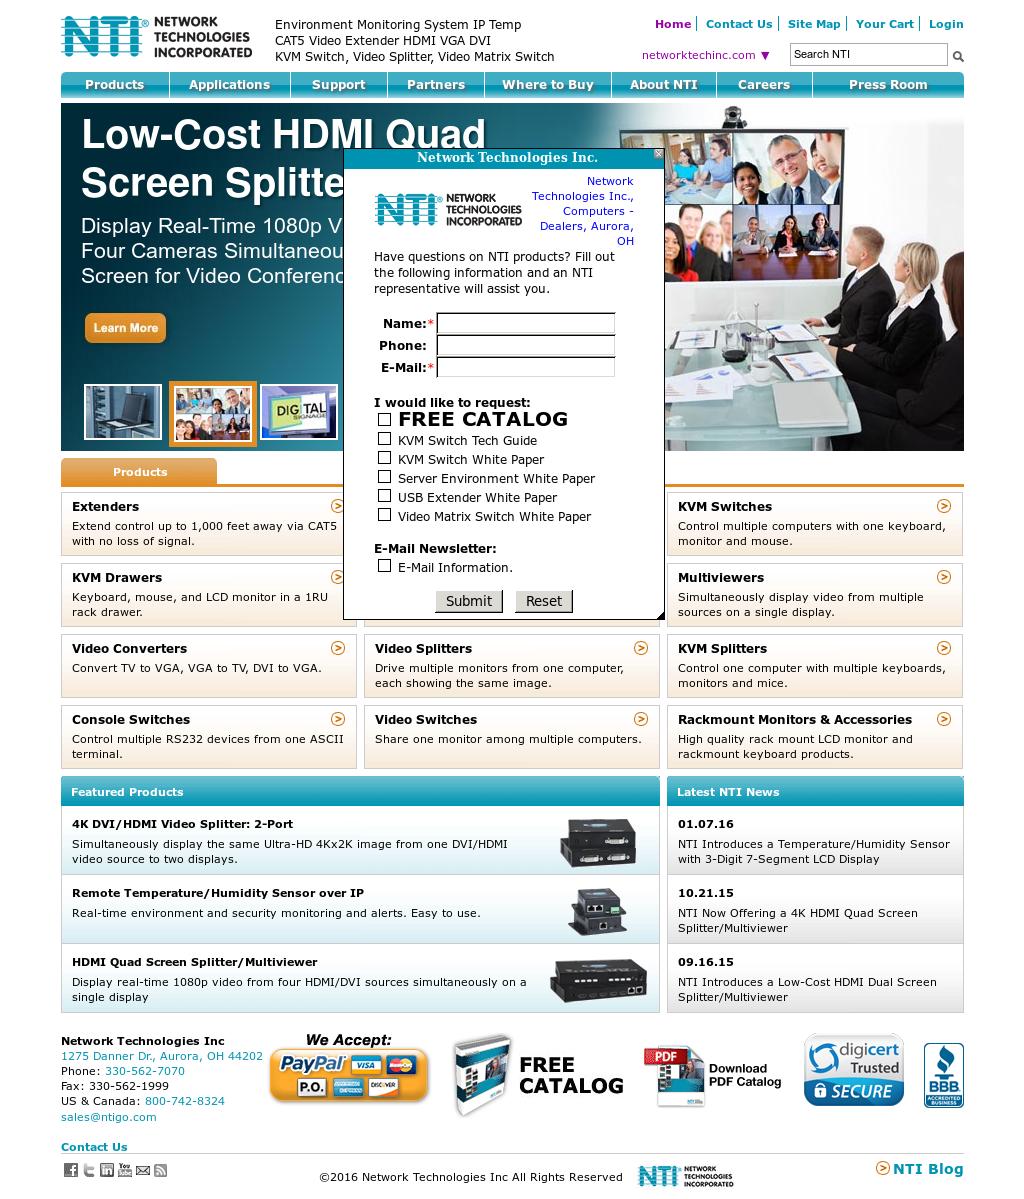 Owler Reports - Press Release: NTI : NTI Now Offering a 4K HDMI